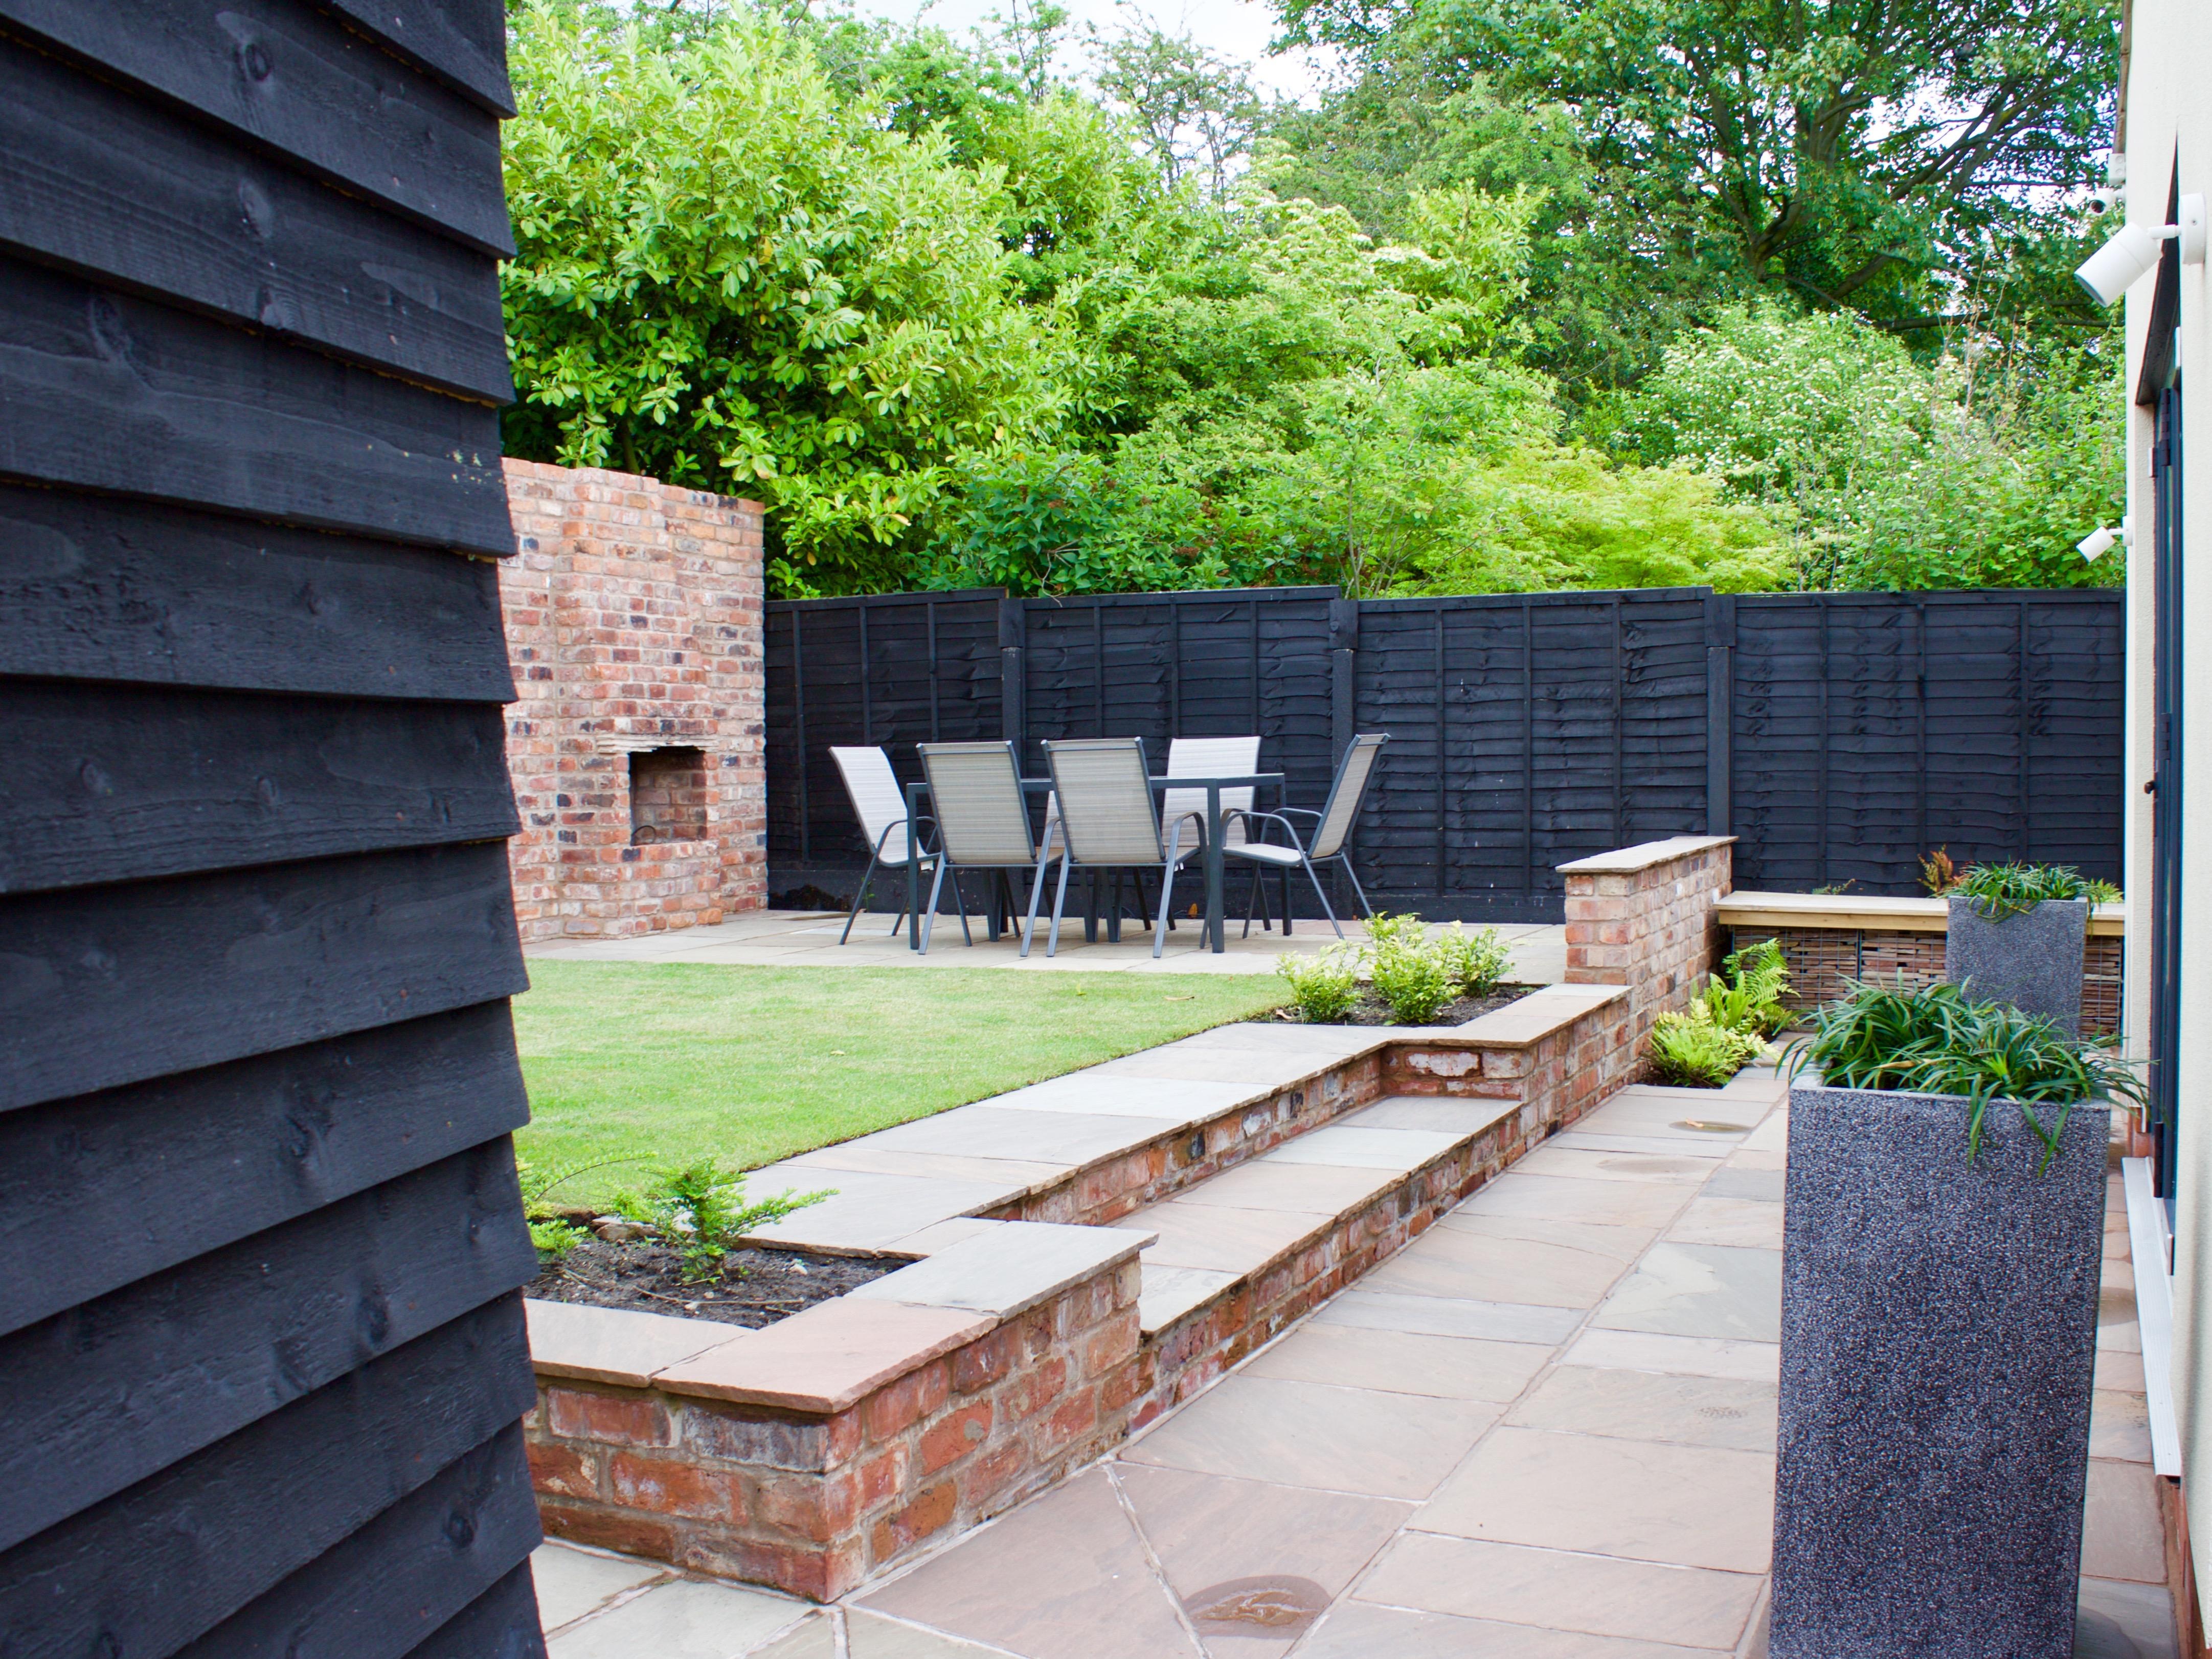 Modern Family Garden Design in Sale, Altrincham, Chorlton, Didsbury, Knutsford, Wilmslow, Macclesfield, Alderley Edge, Cheshire, Manchester, Lancashire, Chester, Wales & North West